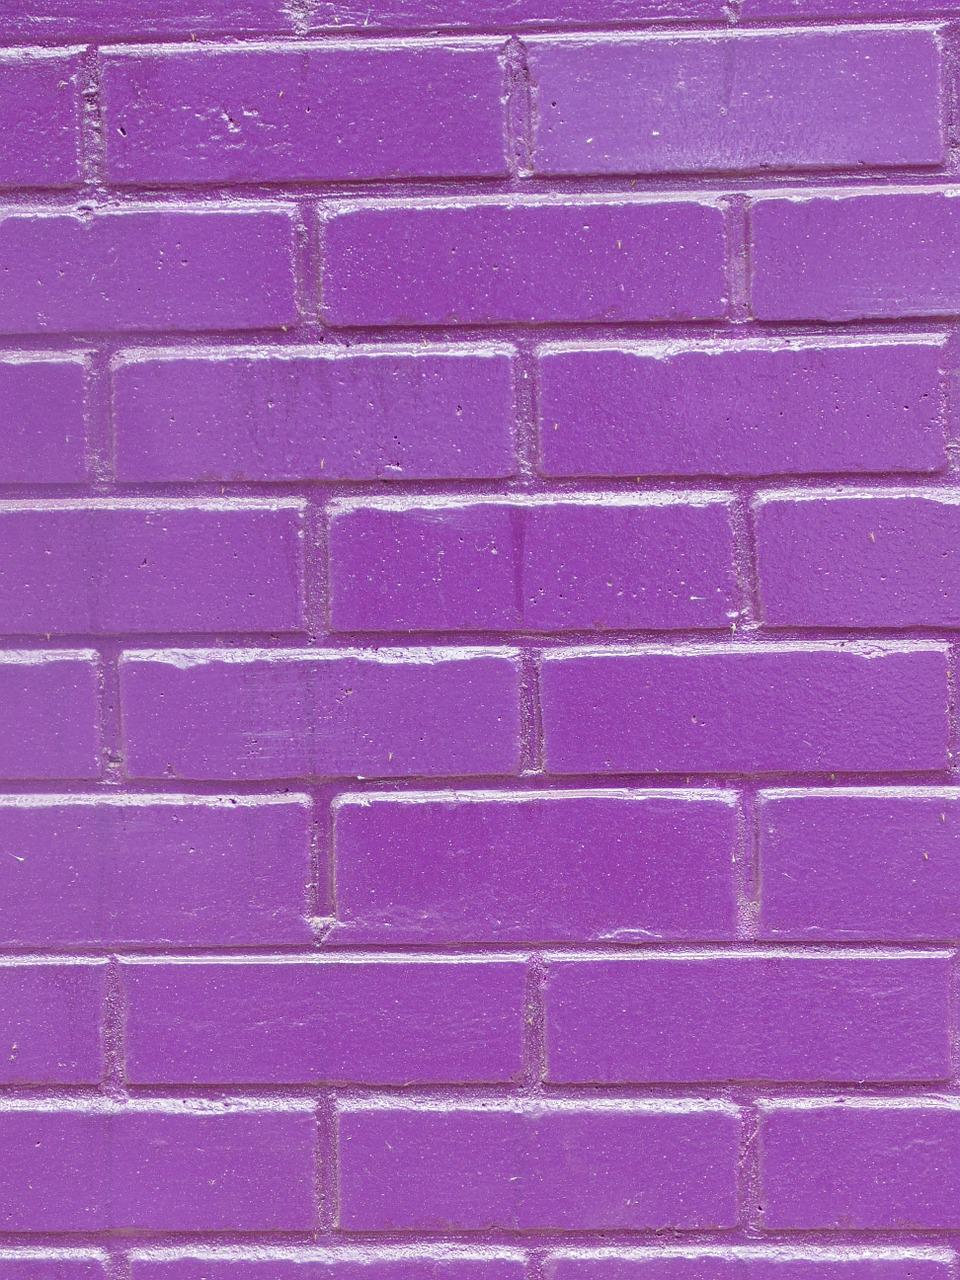 Фон фиолетовая стена